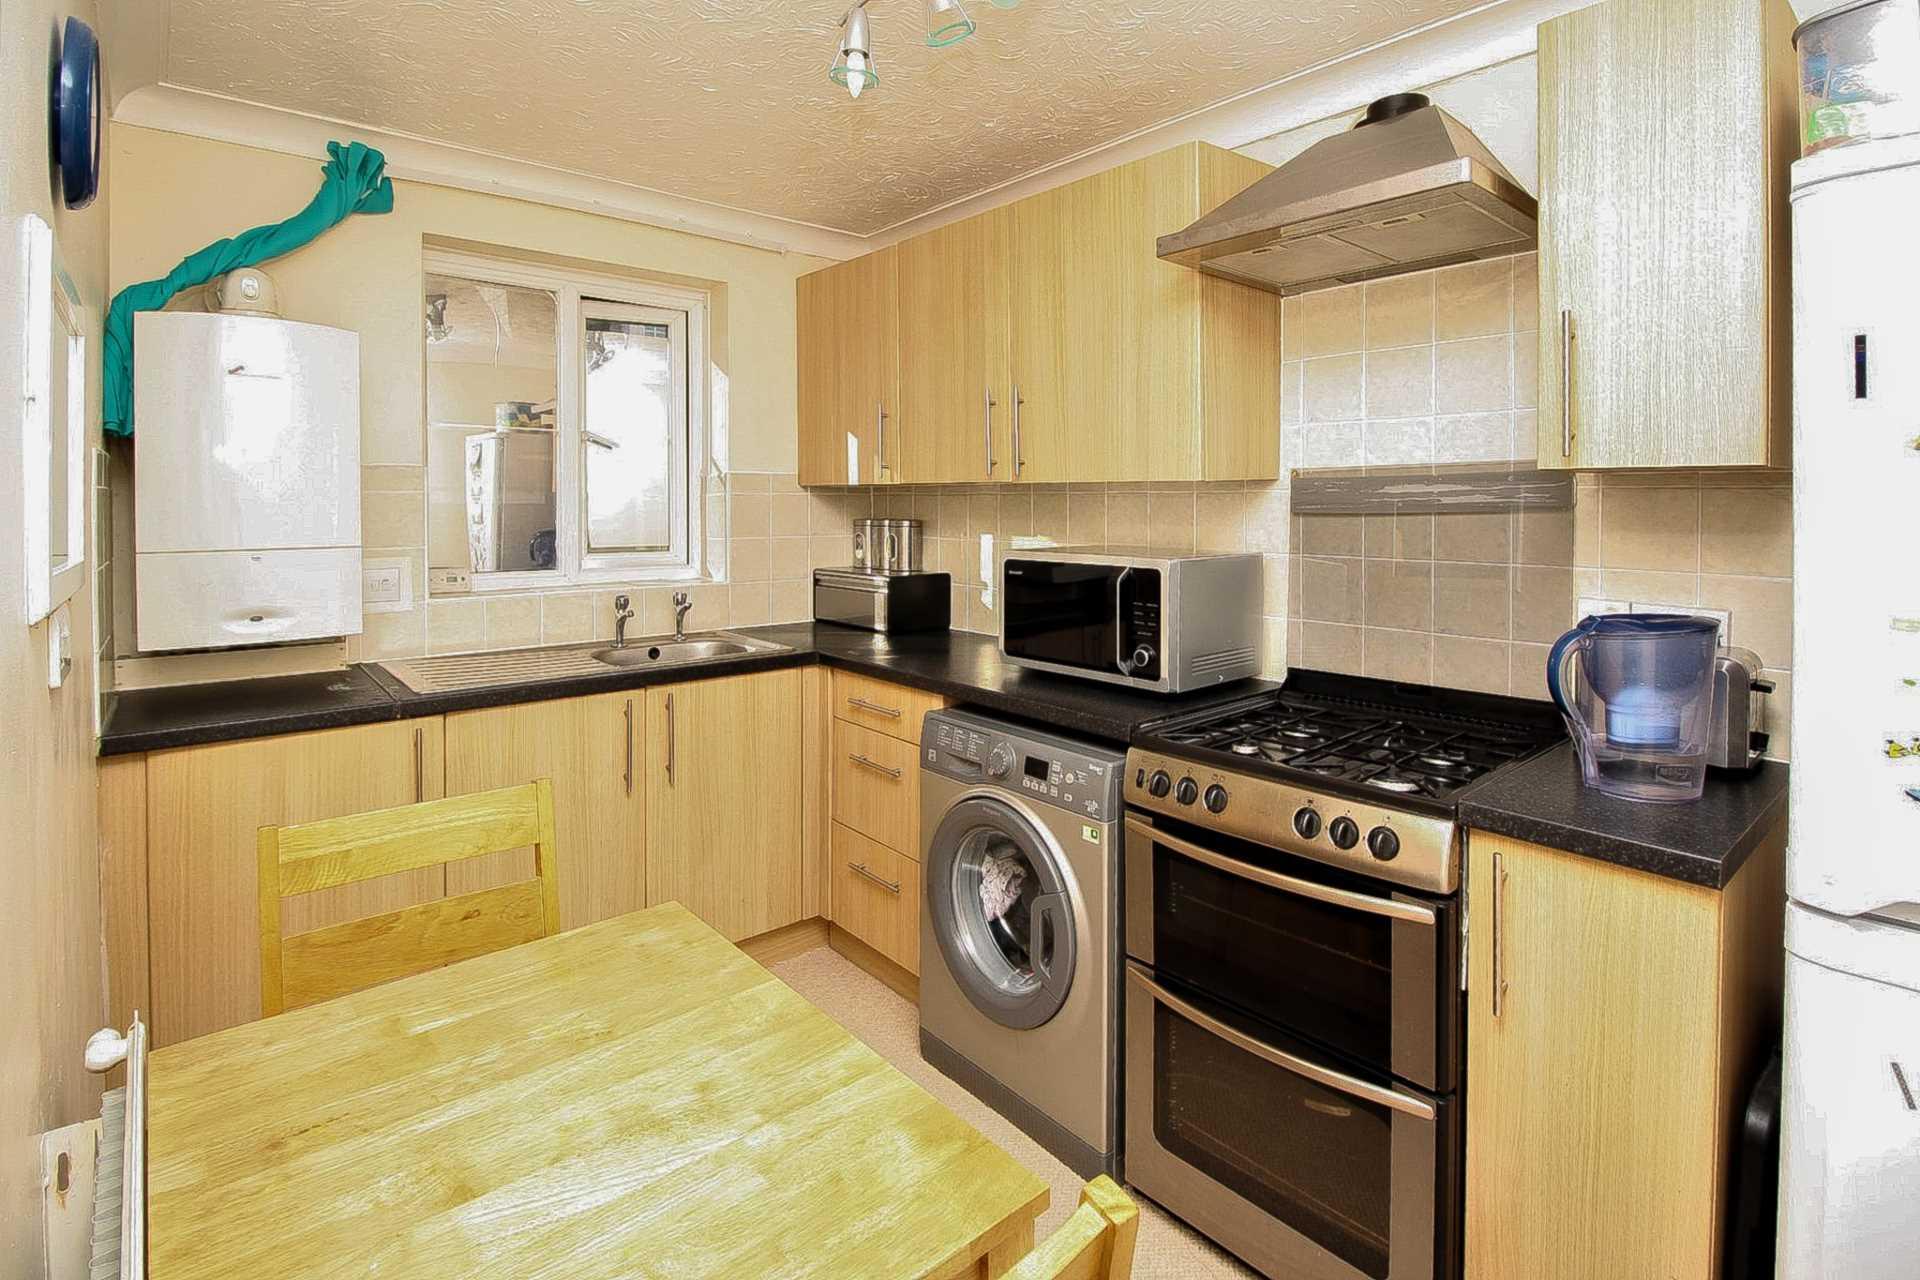 2 bed flat for sale in Dorset Mews, Dorset Street, Blandford Forum 1